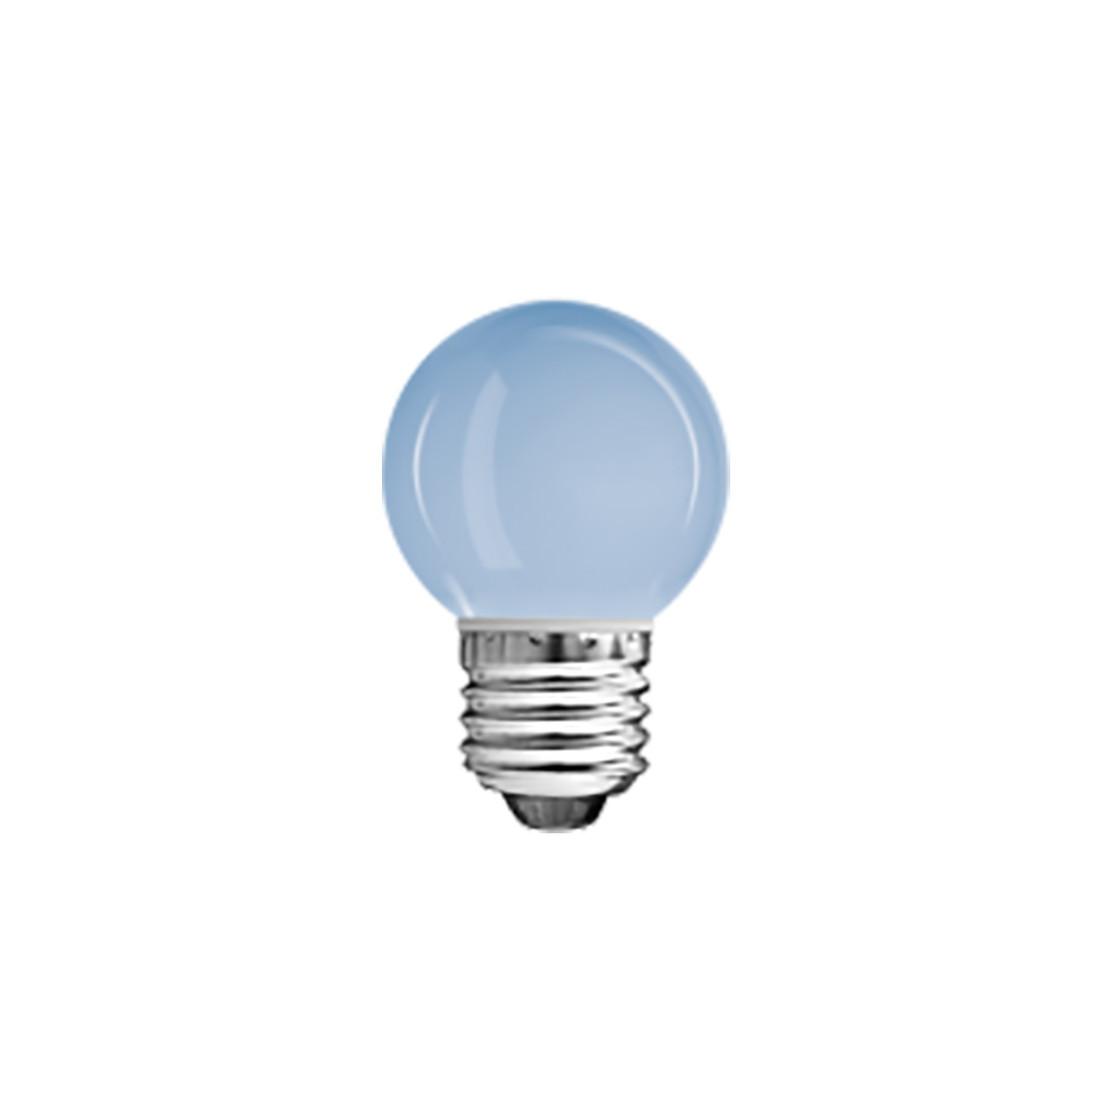 m ller licht 18660 led dekolicht tropfen 0 6 w e27 blau lampen ra 1 99. Black Bedroom Furniture Sets. Home Design Ideas